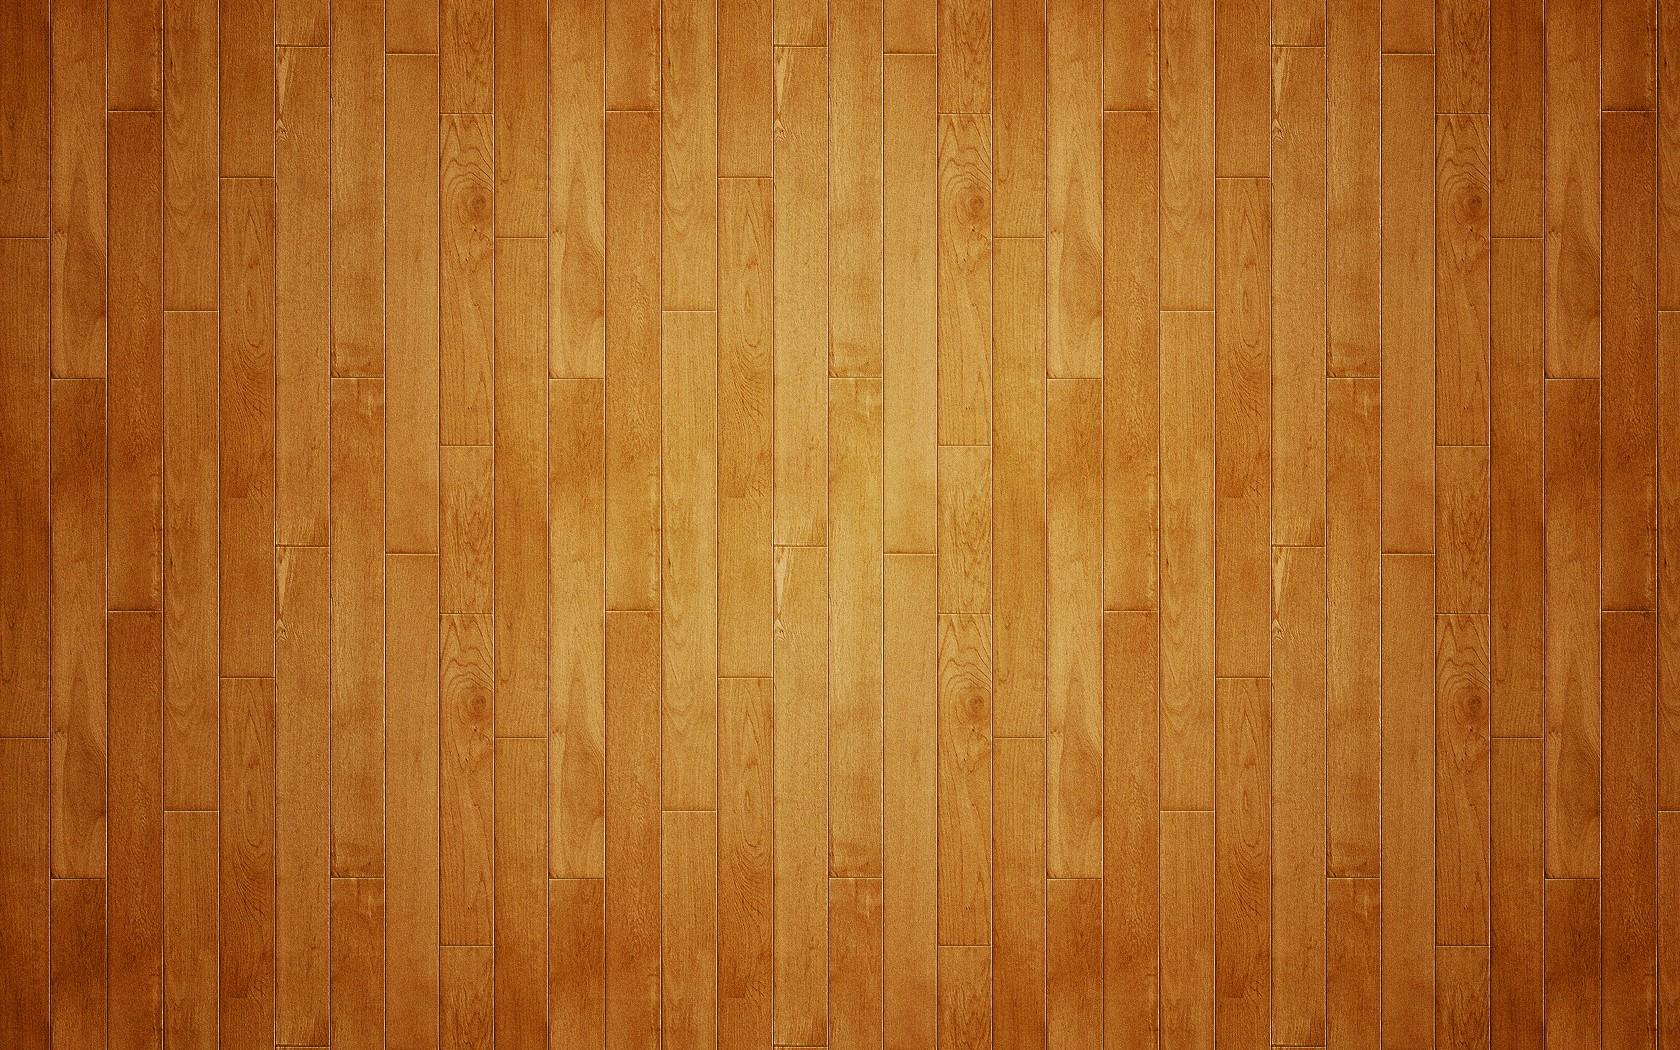 Textura de madera maker community for Piso laminado de madera